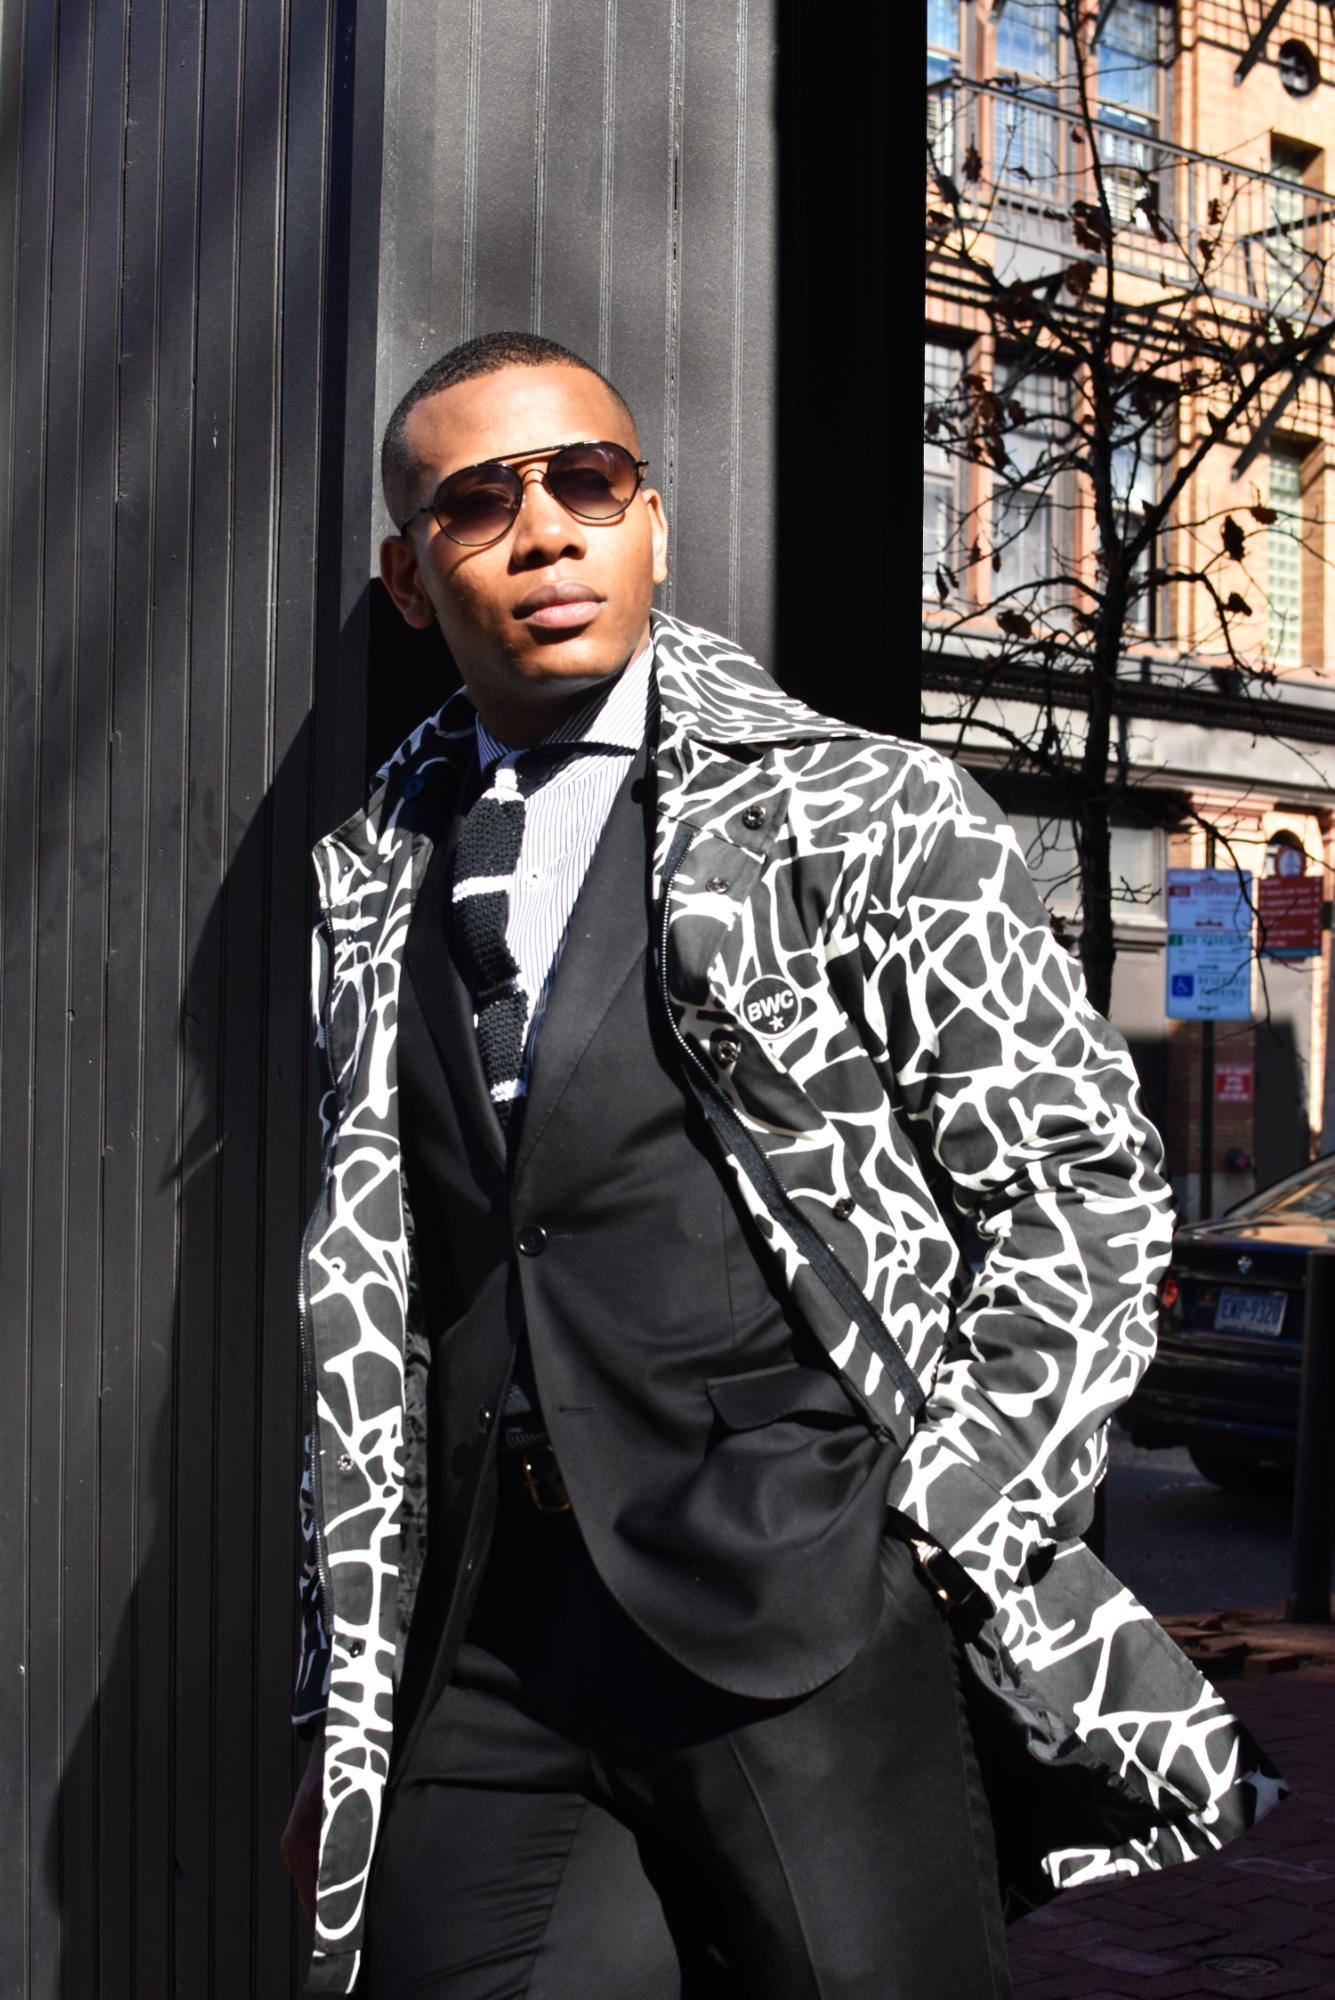 Sabir of Men's Style Pro in BWC Garments Black & White Jacket Bold Outerwear